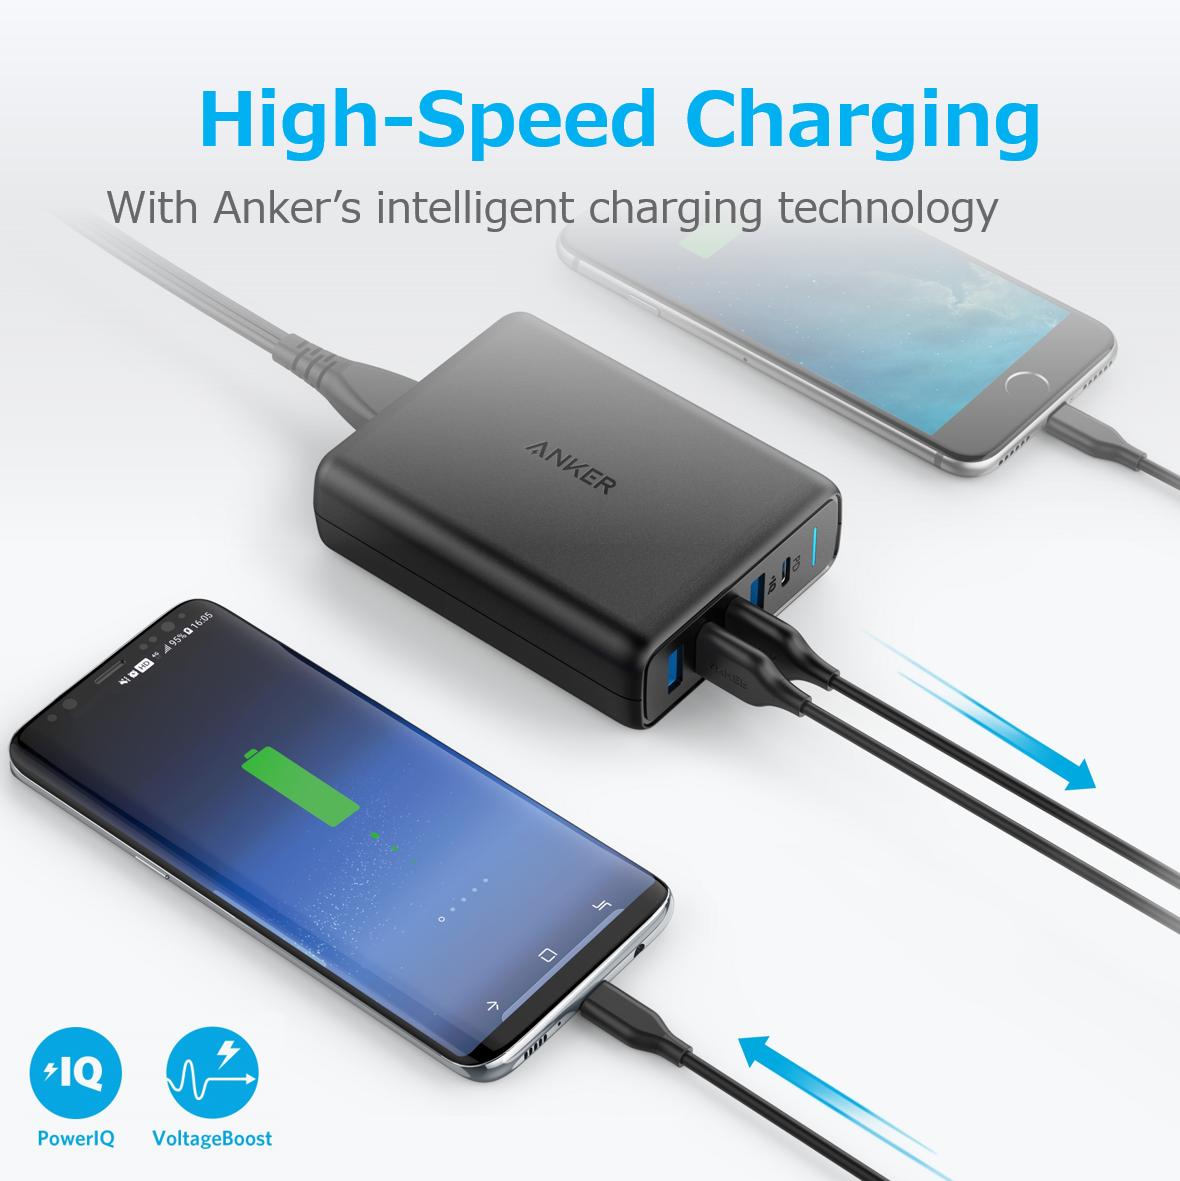 iPhoneを2時間足らずでフル充電、5台同時充電可能な「Anker PowerPort I PD」が発売